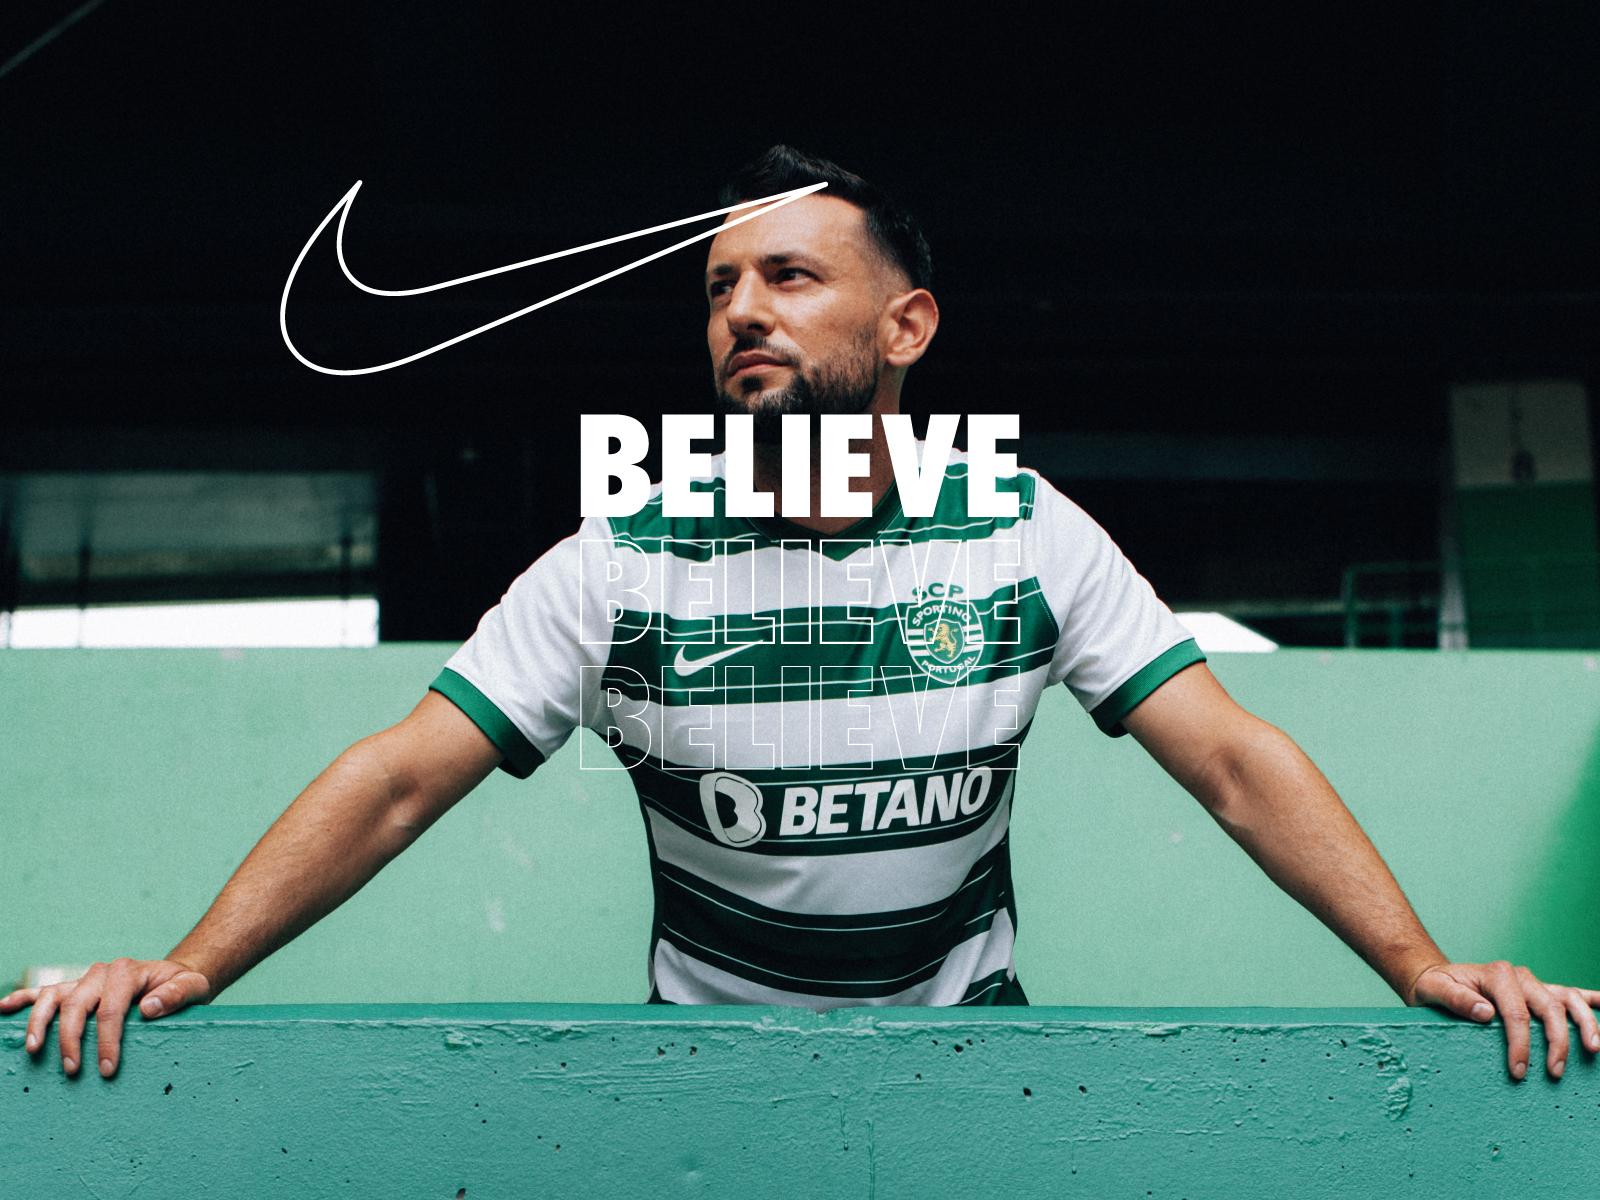 https://scpconteudos.pt/sites/default/files/revslider/image/Banner-HP-Nike-Believe.jpg